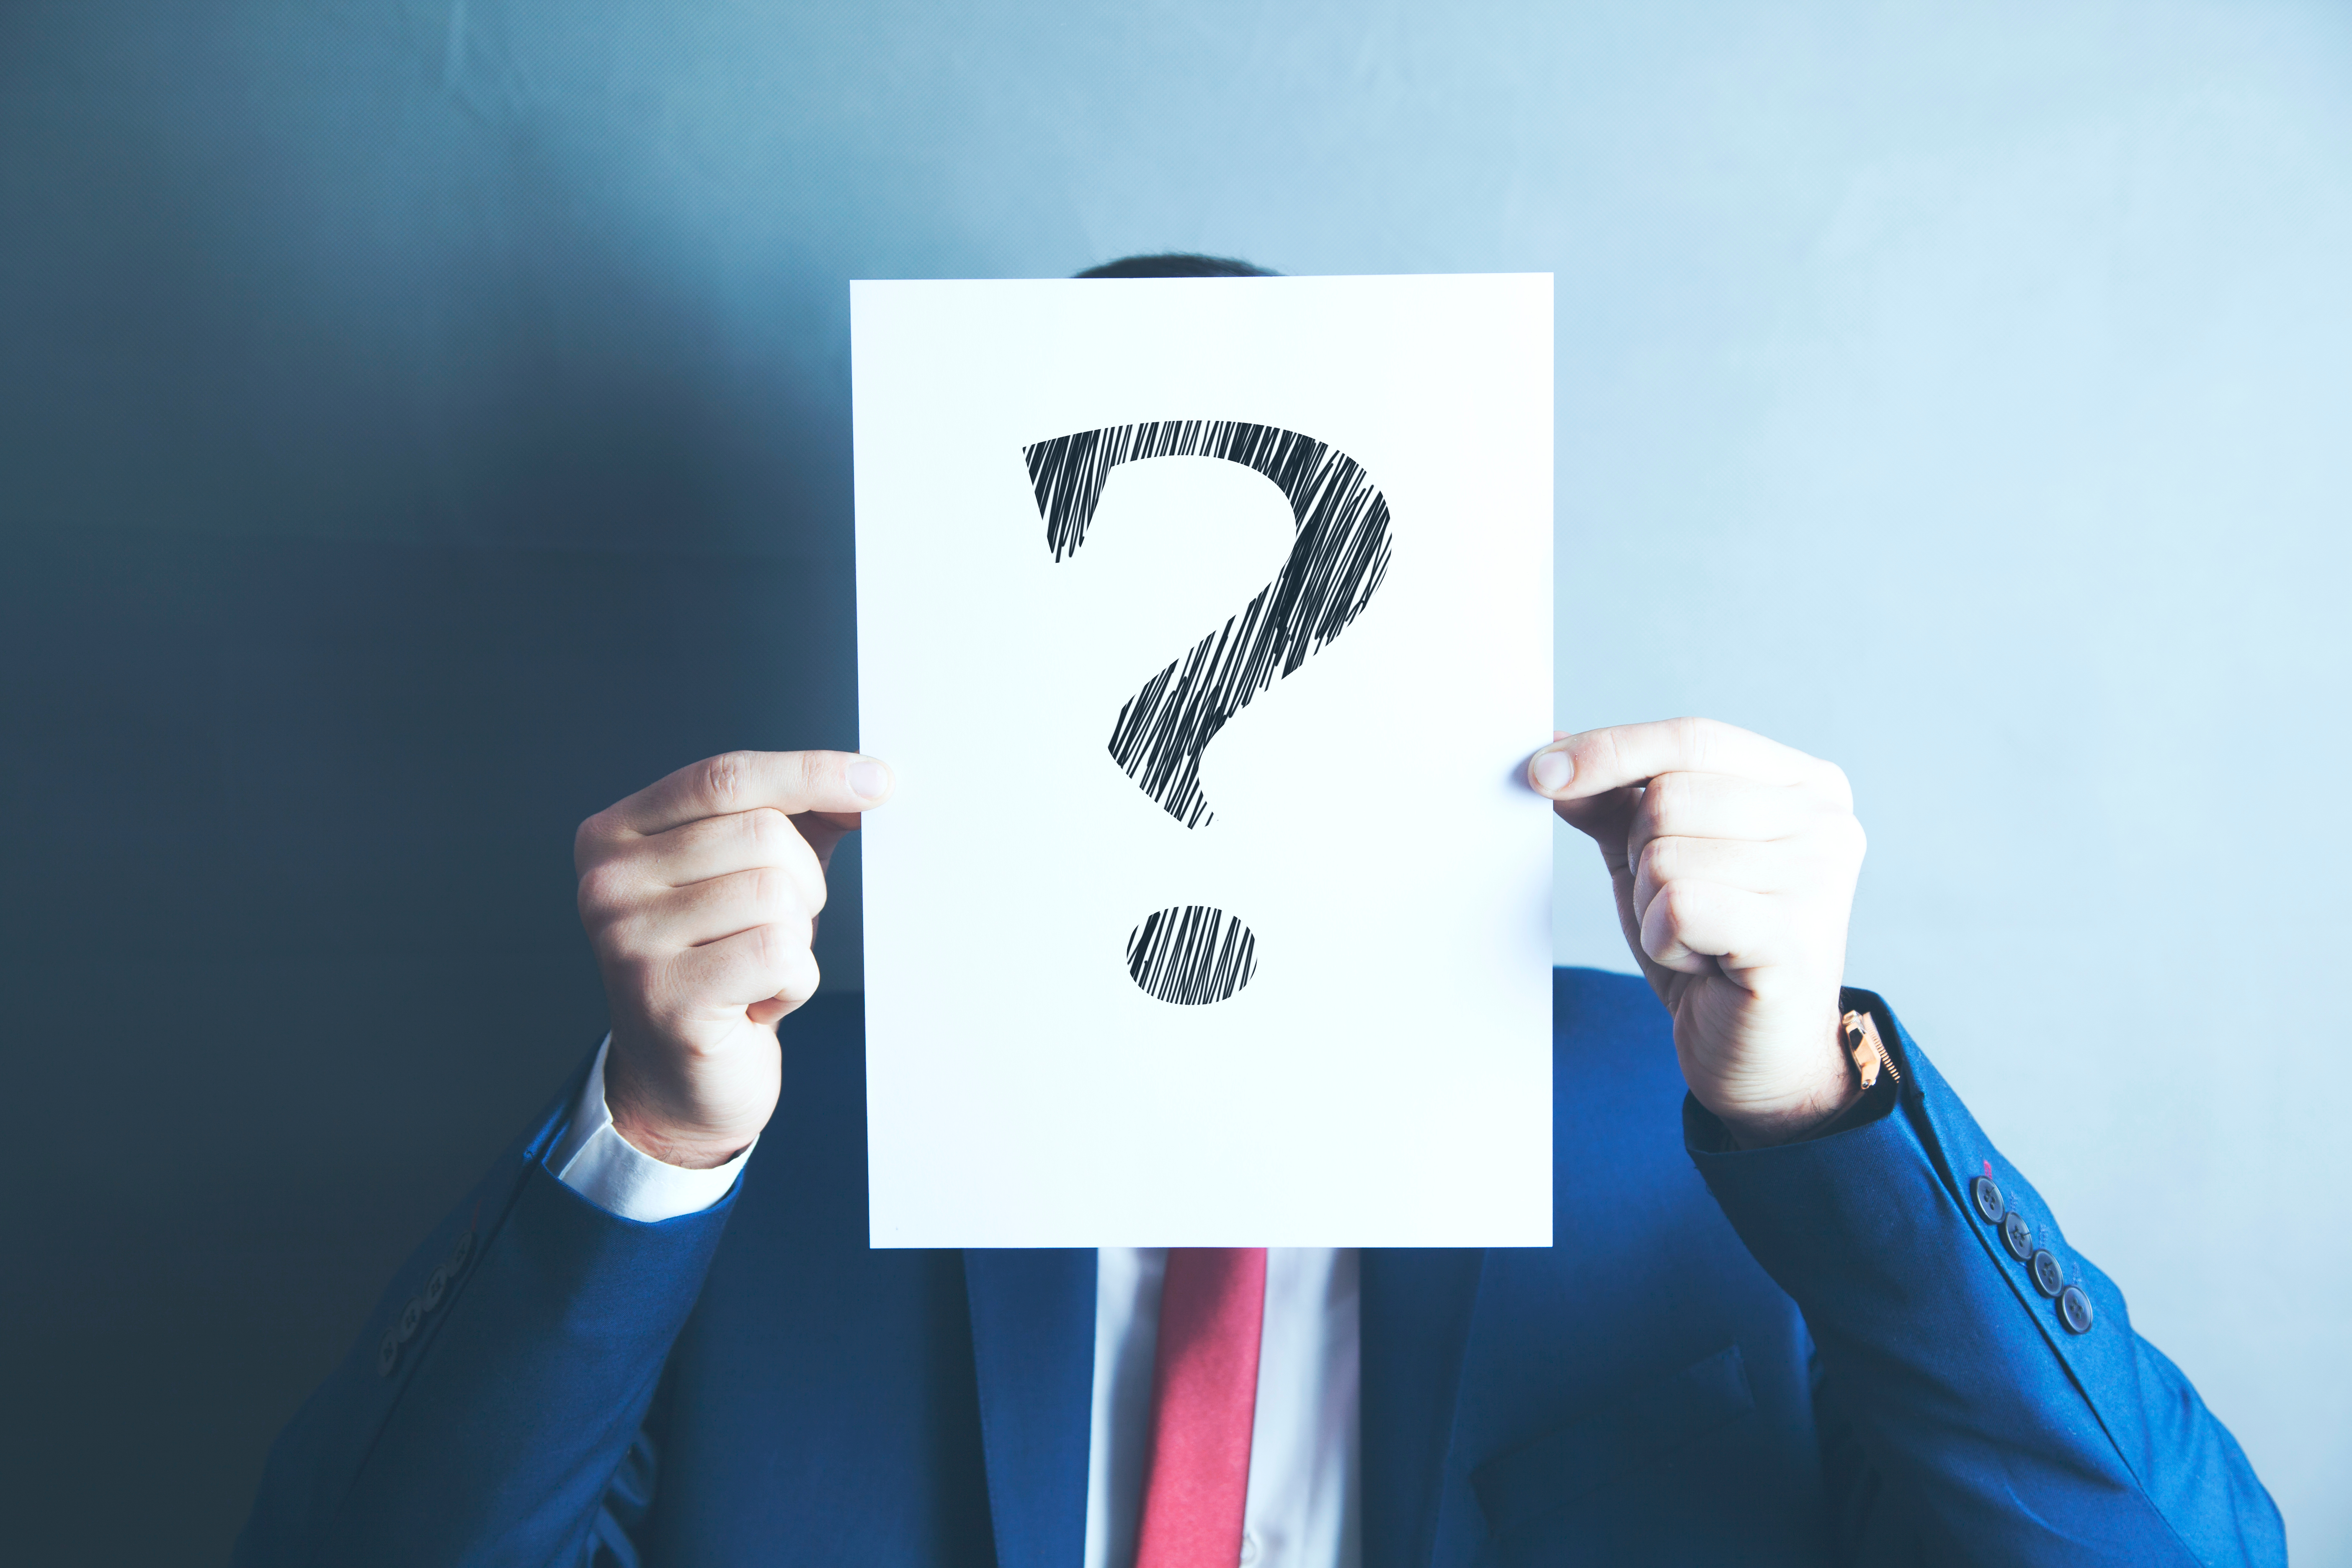 web集客の仕組み化!集客で成功する人に共通する2つの質問とは?